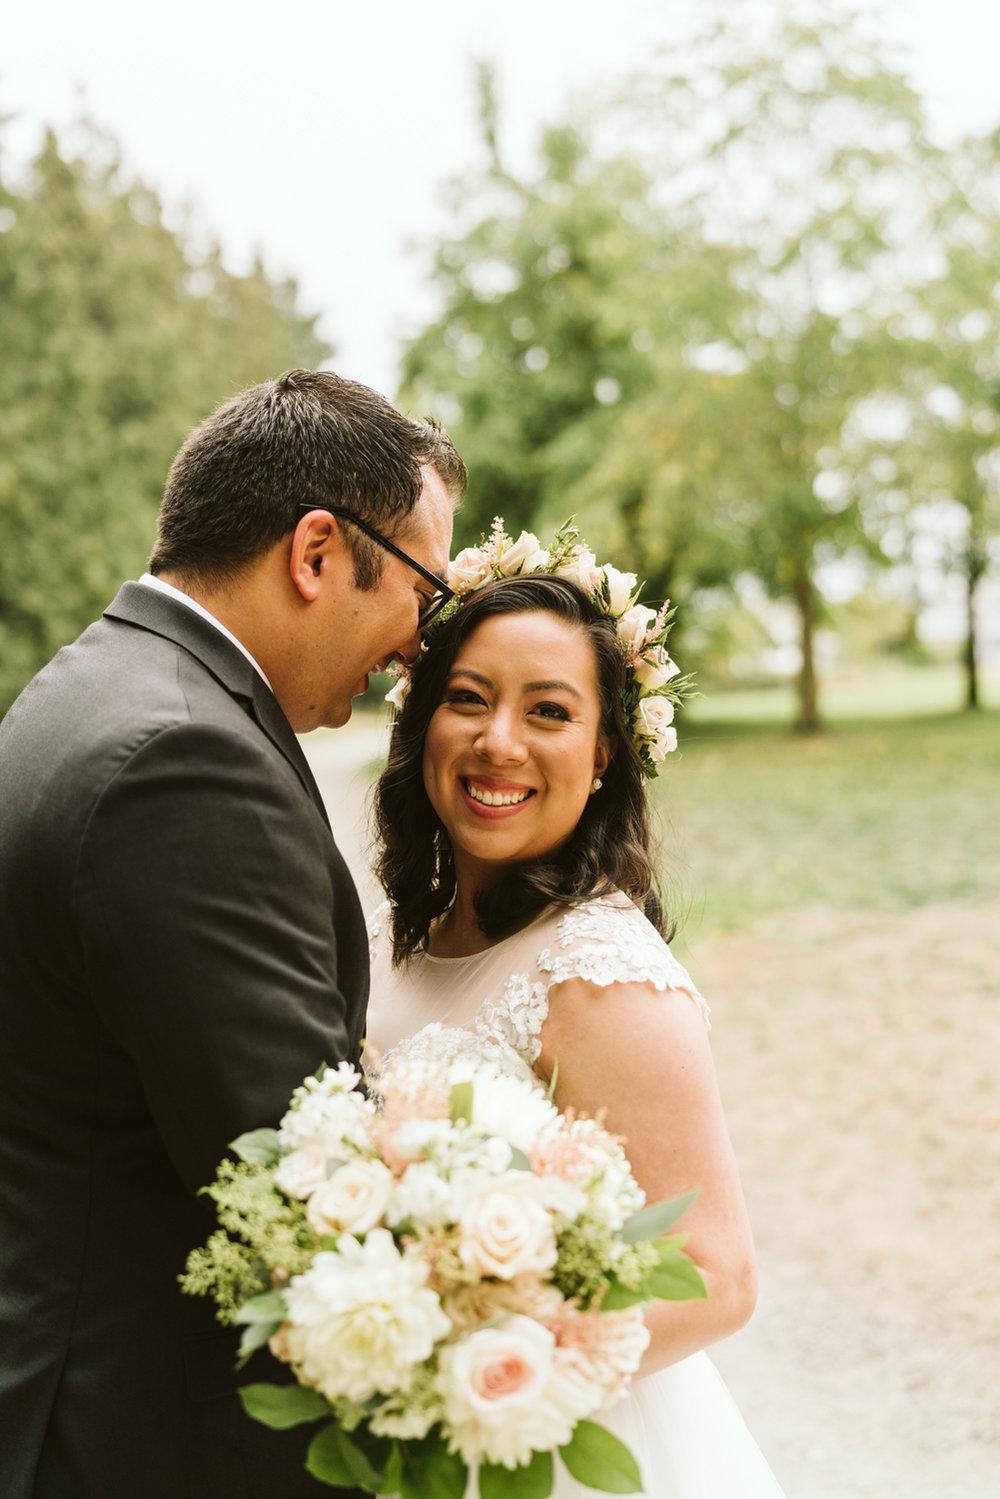 April Yentas Photography - Nina & Chris slideshow-7.jpg